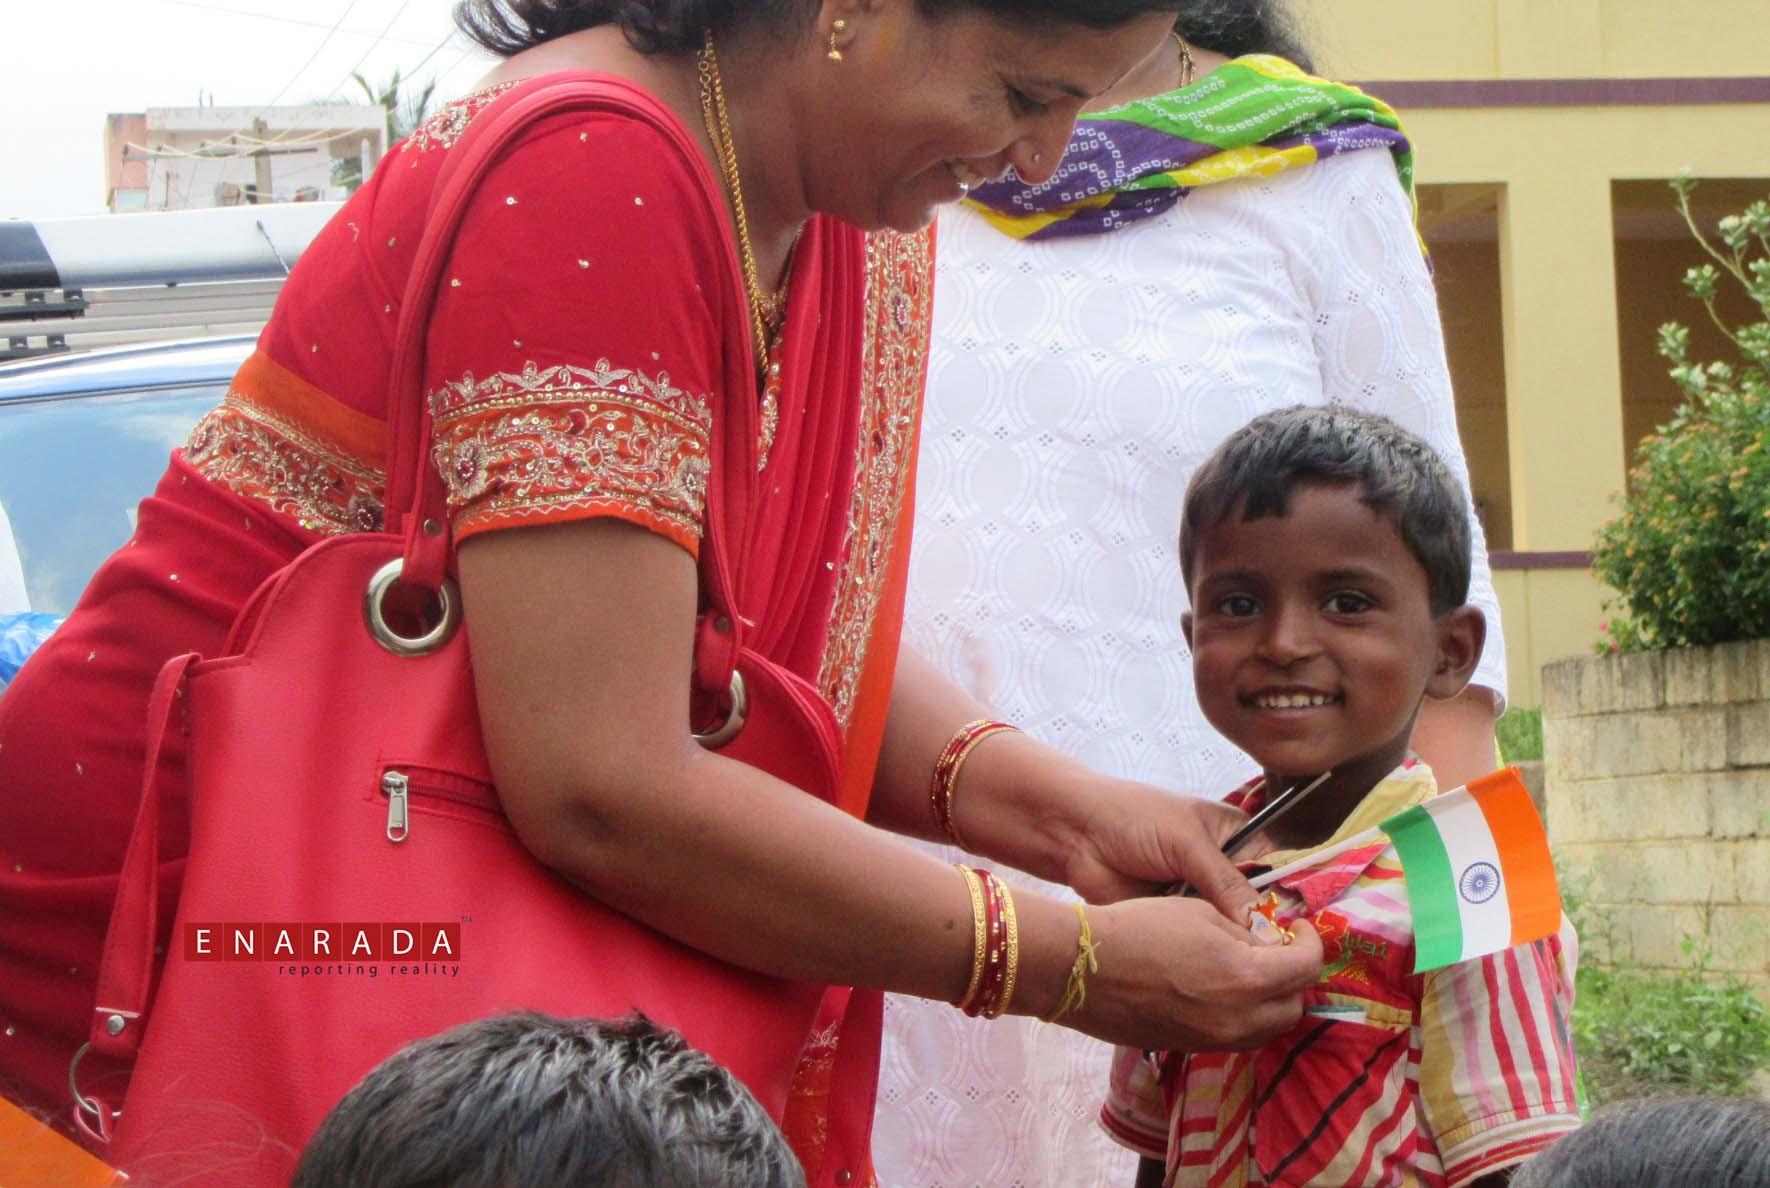 Art of Giving volunteers celebrating I-day with street kids. eNarada Photos.